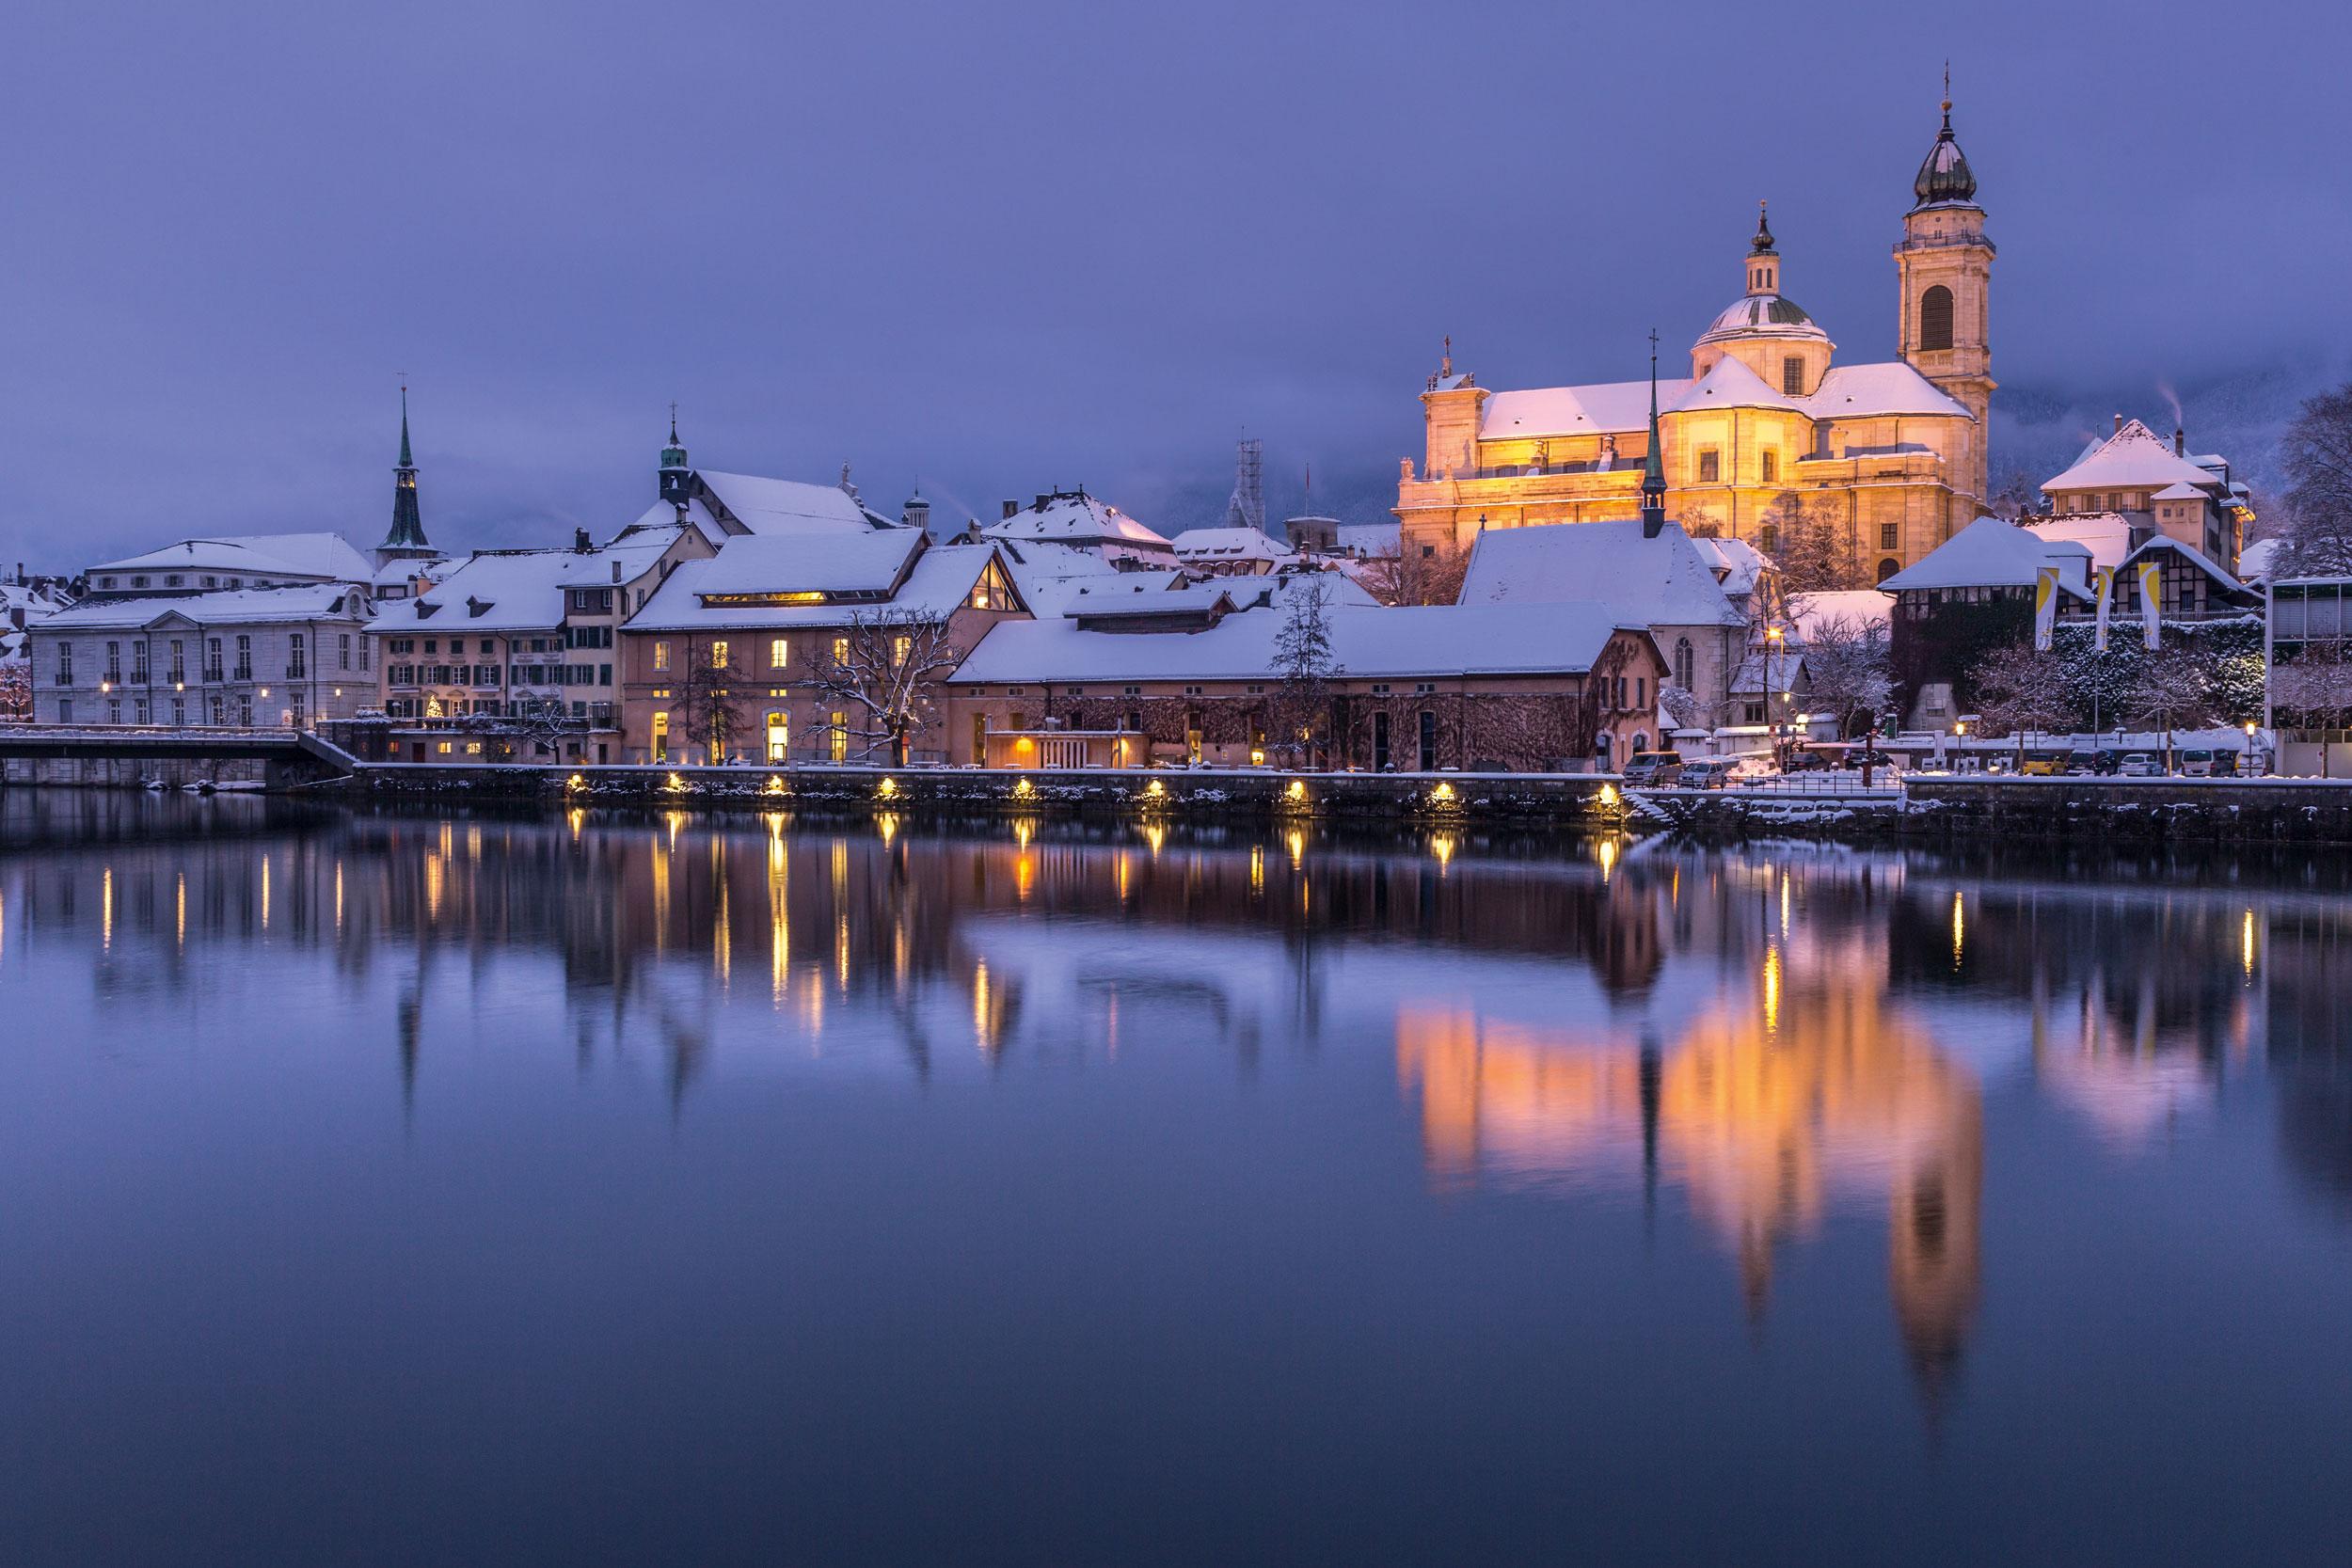 solothurn-winter